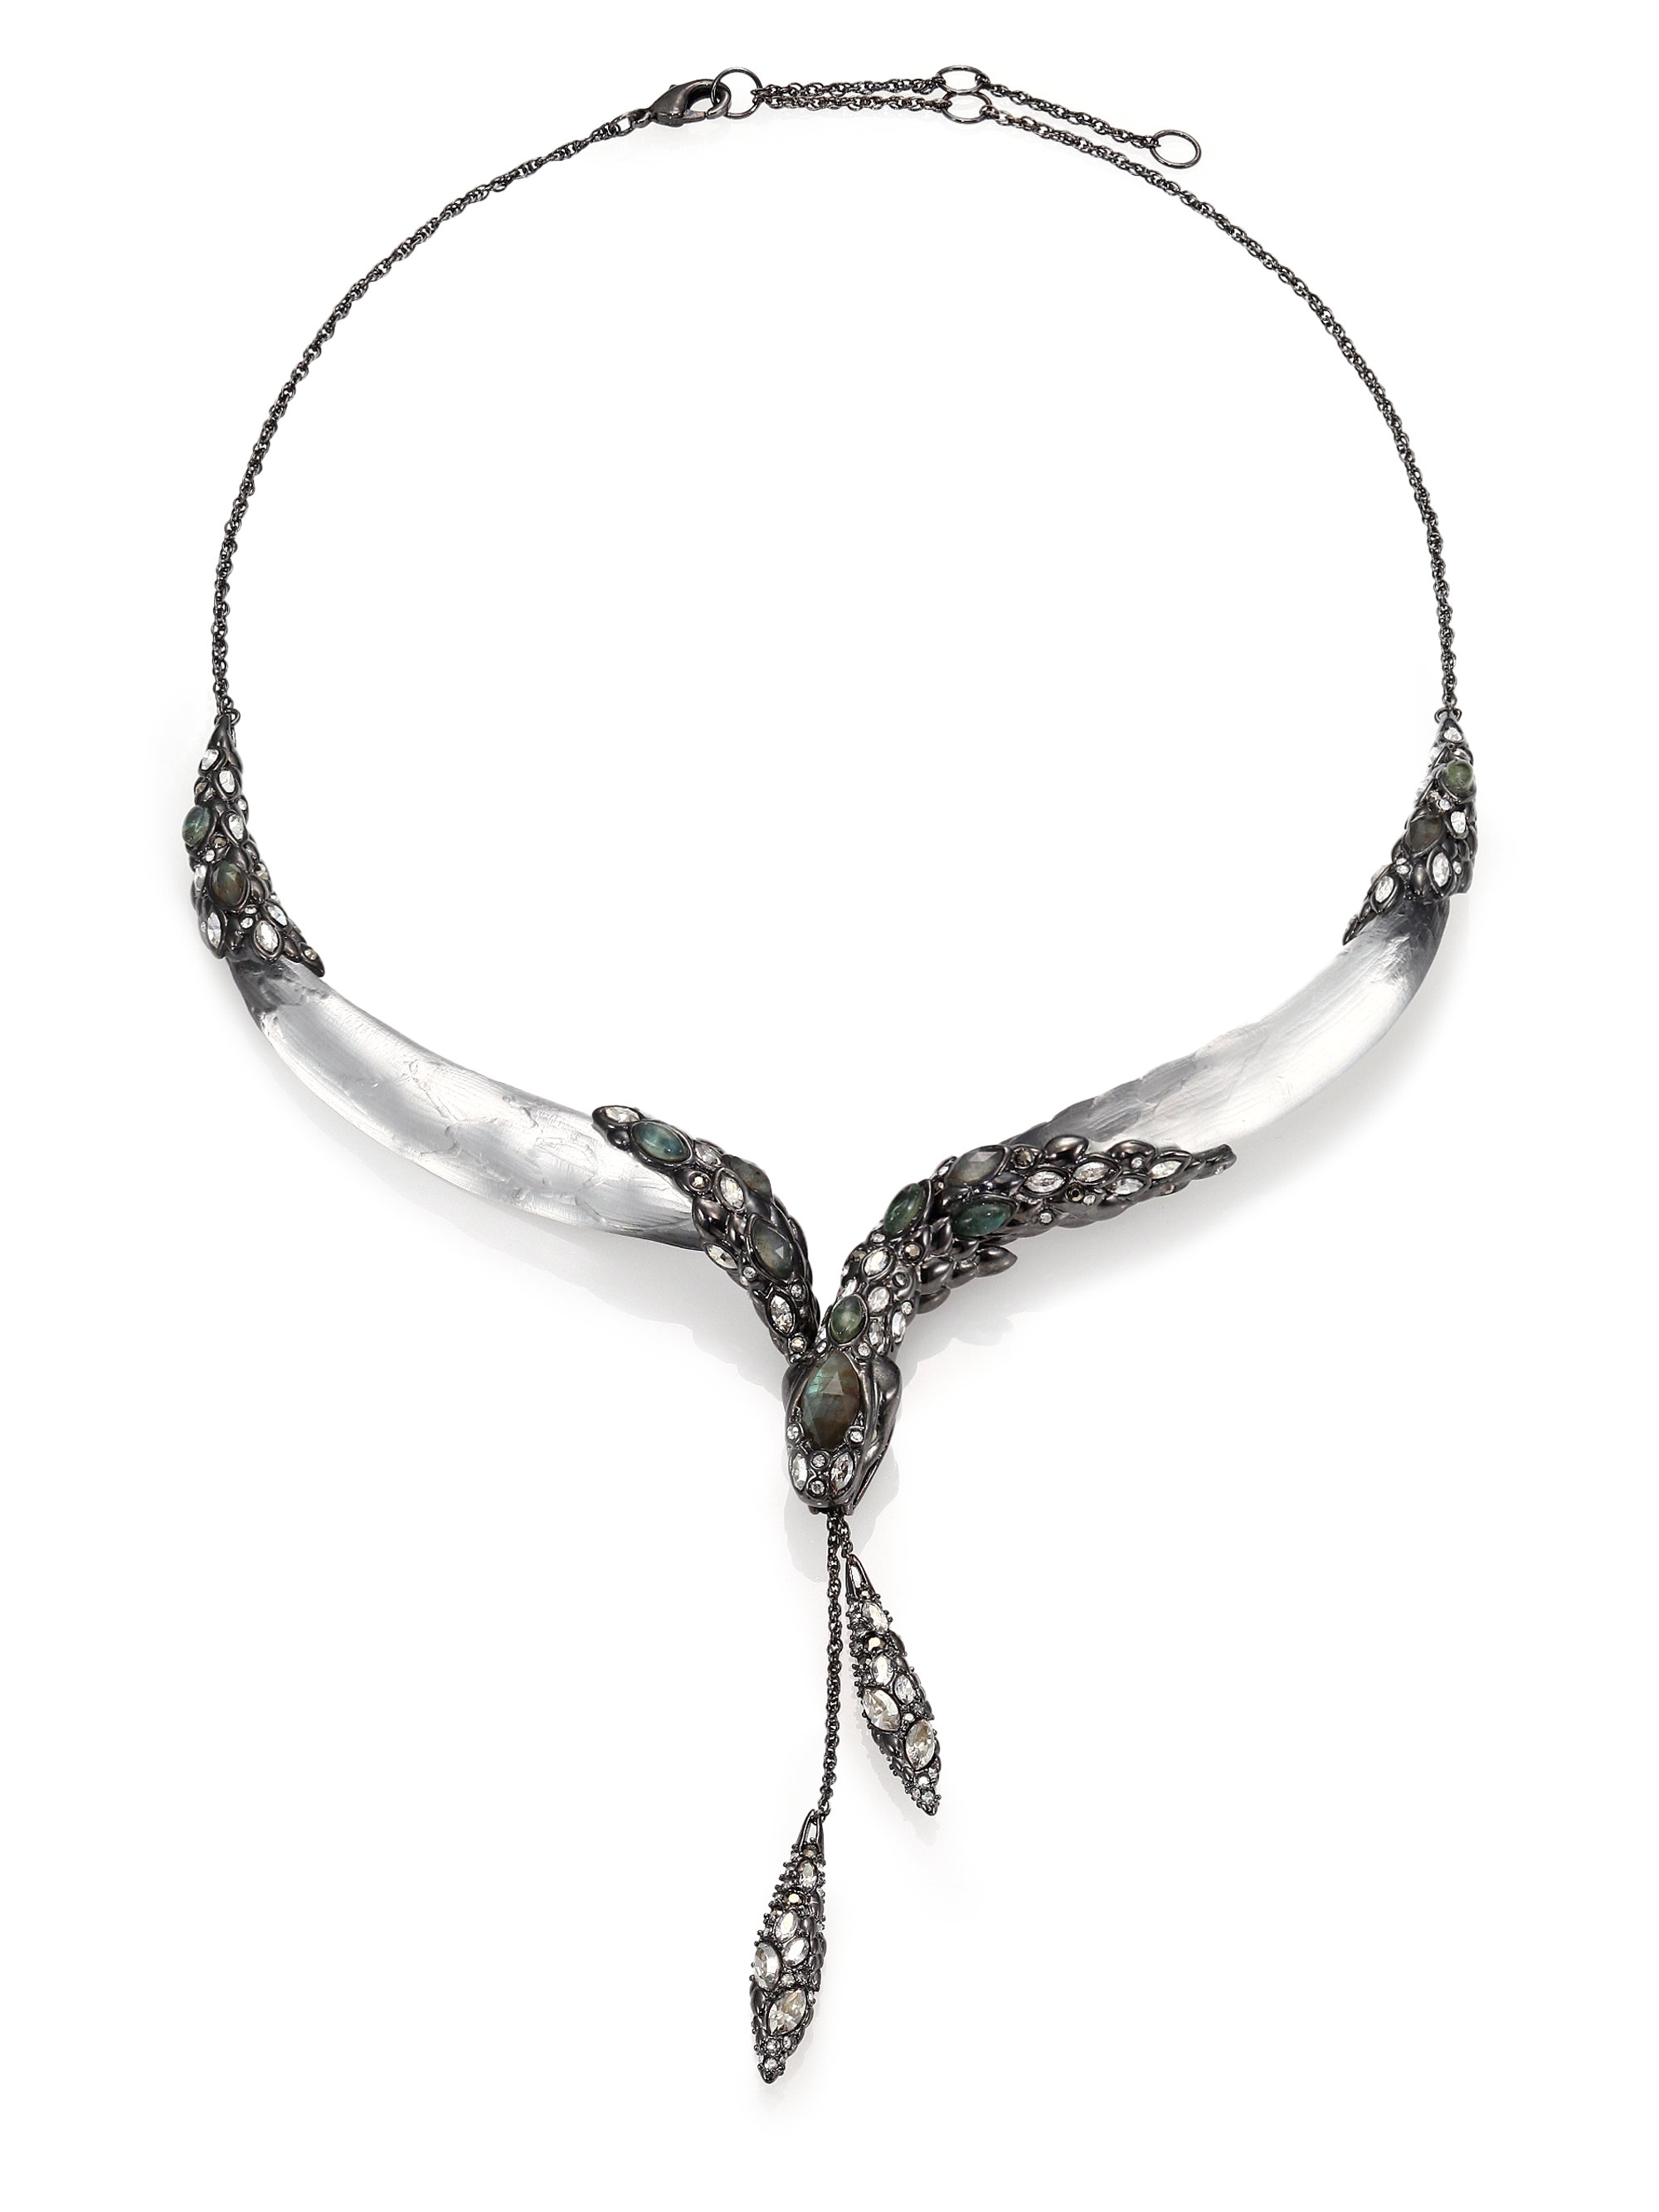 Alexis Bittar Lucite Collar Necklace Silver ub6Gpz